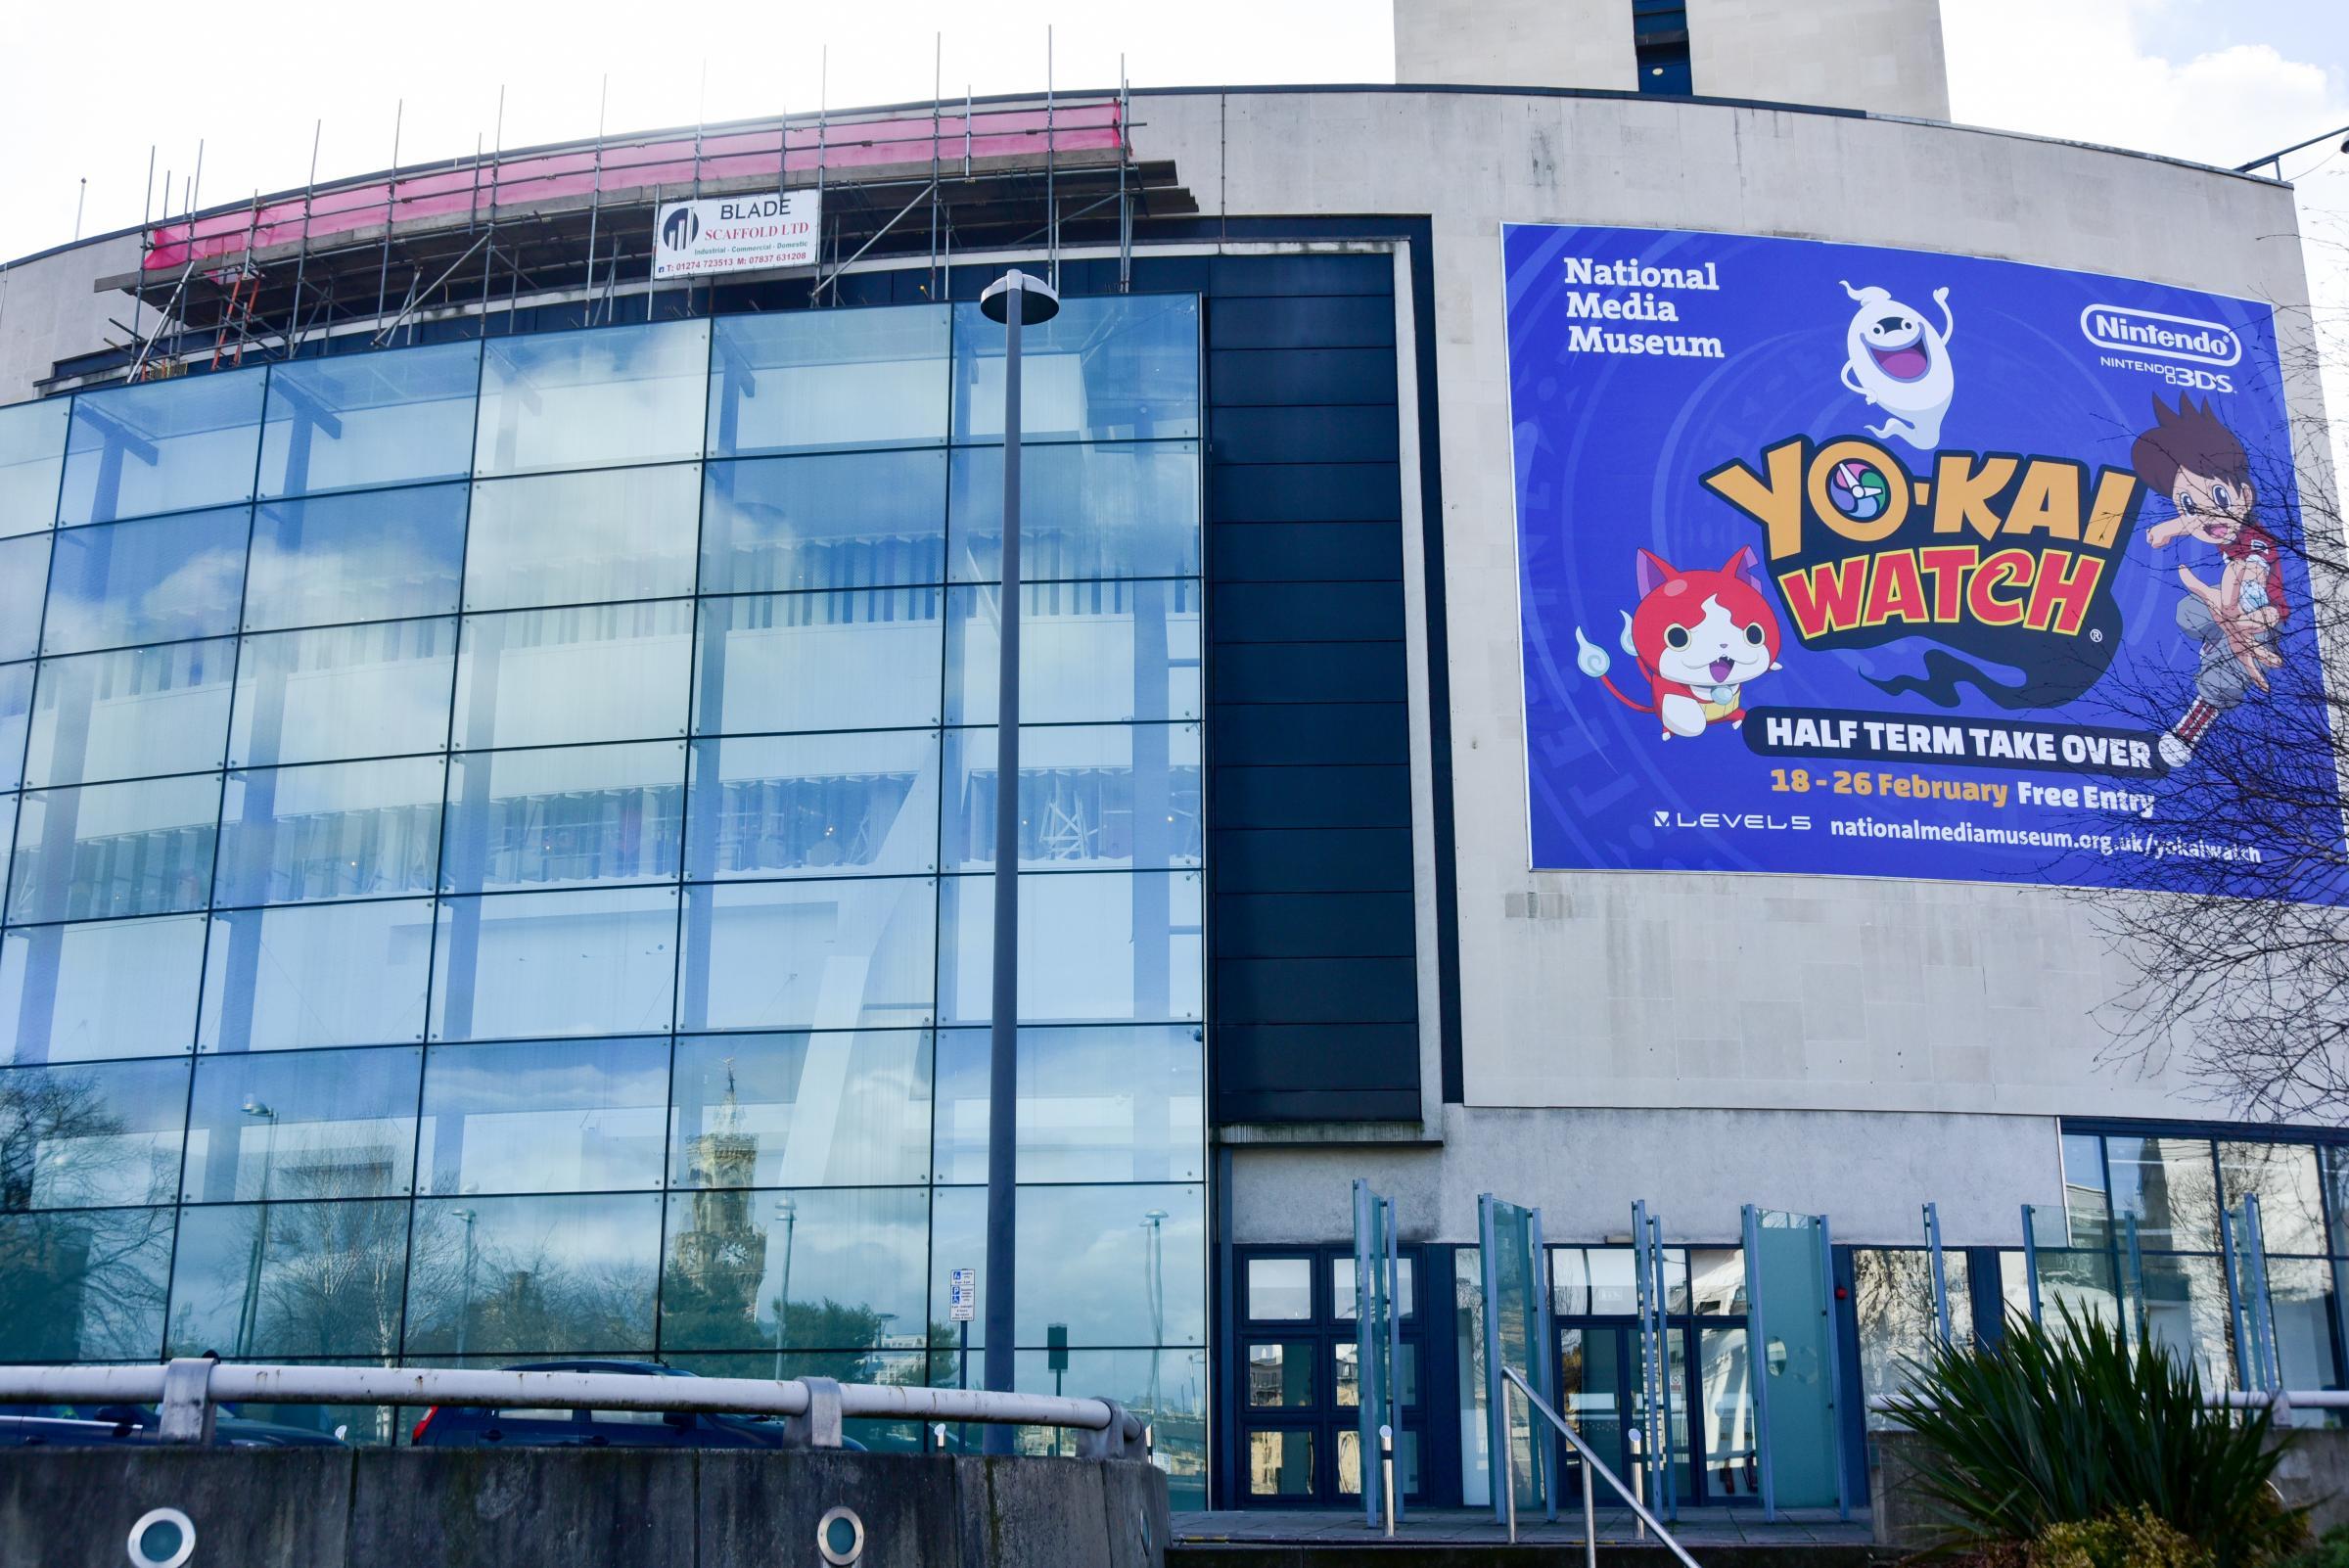 Bradford Media Museum's staff to strike